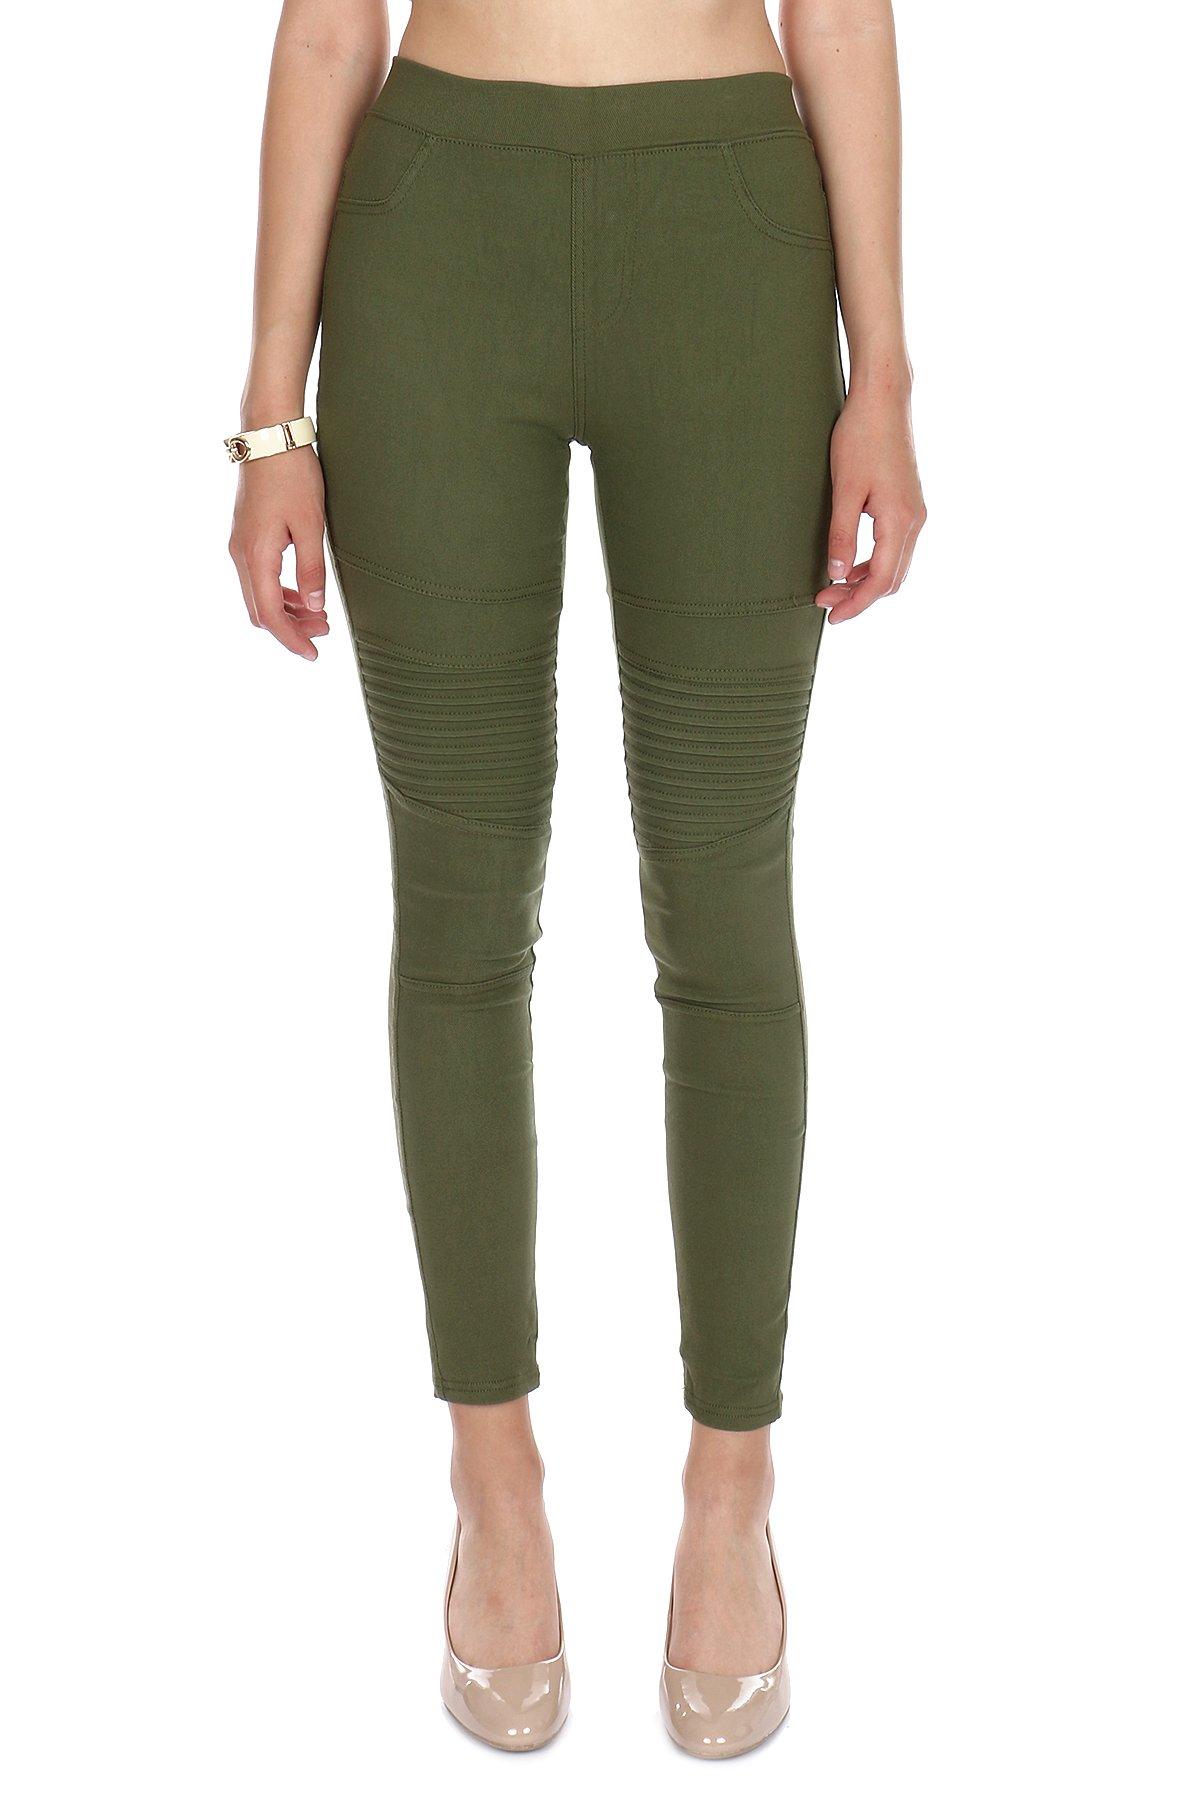 Women's Premium Mid-Rise Moto Style Jeggings- Stretch Denim Feel Leggings (Olive, XS/Small)